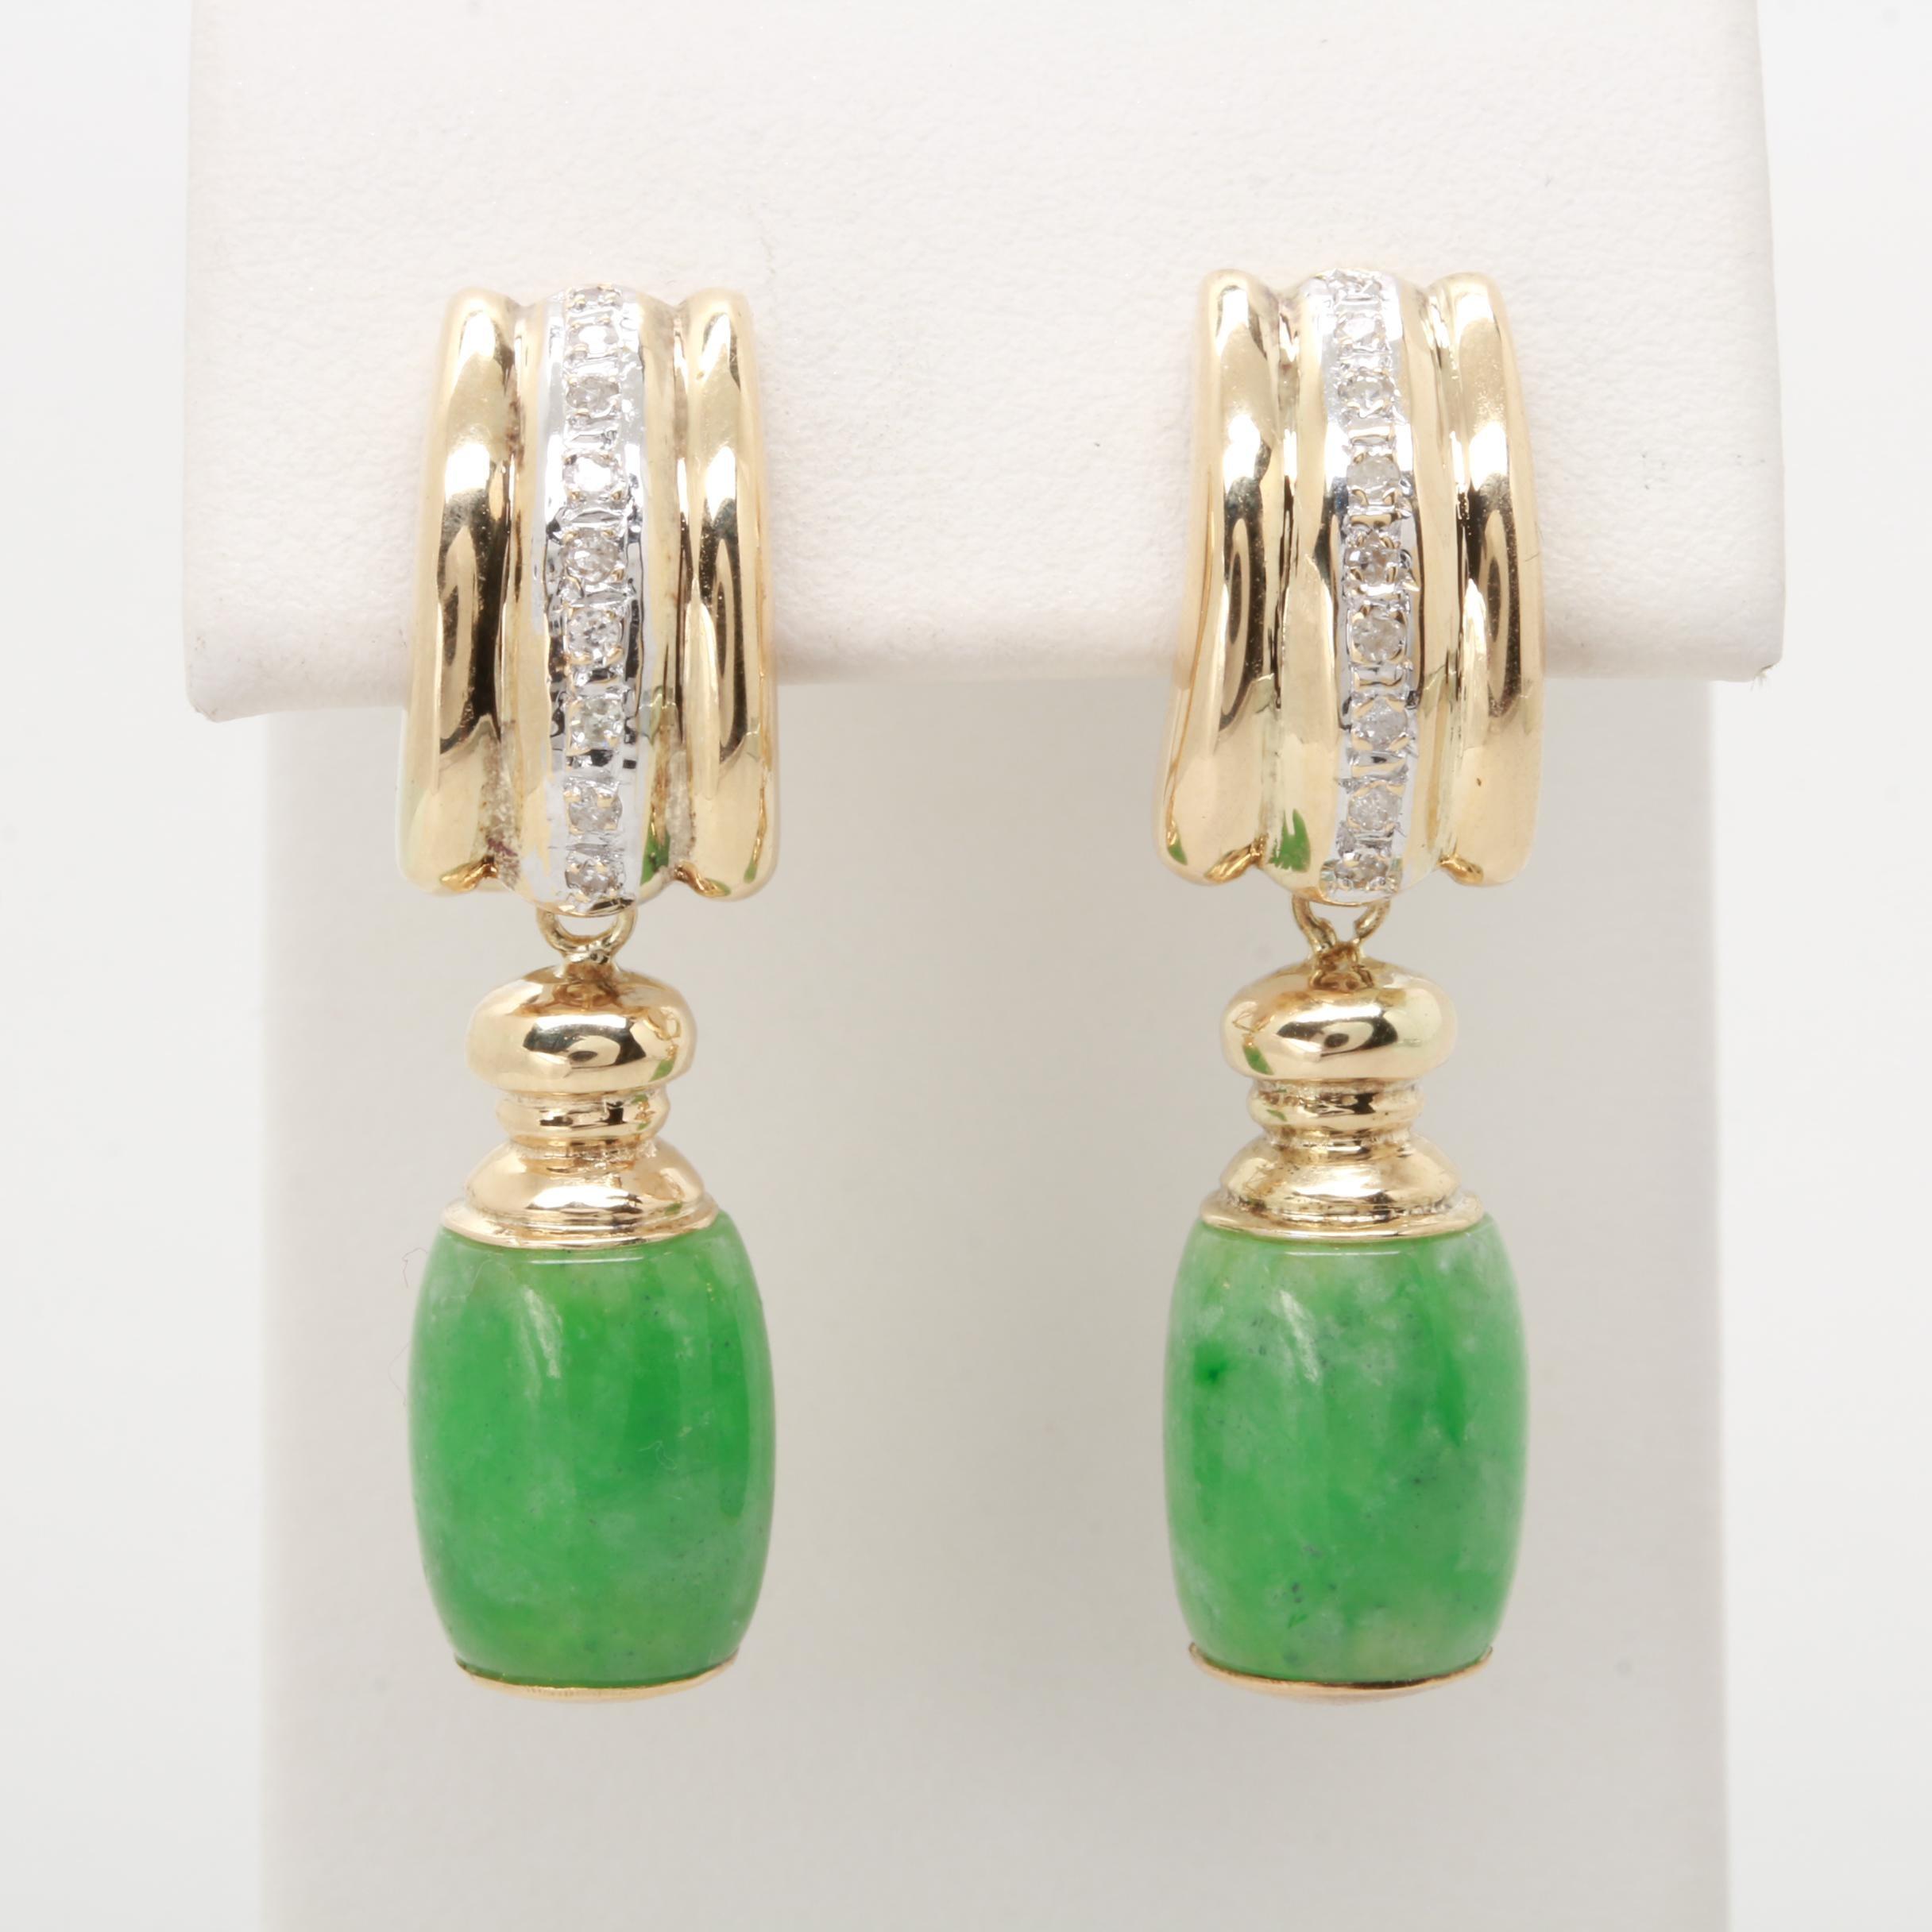 14K Yellow Gold Diamond and Jadeite Dangle Earrings